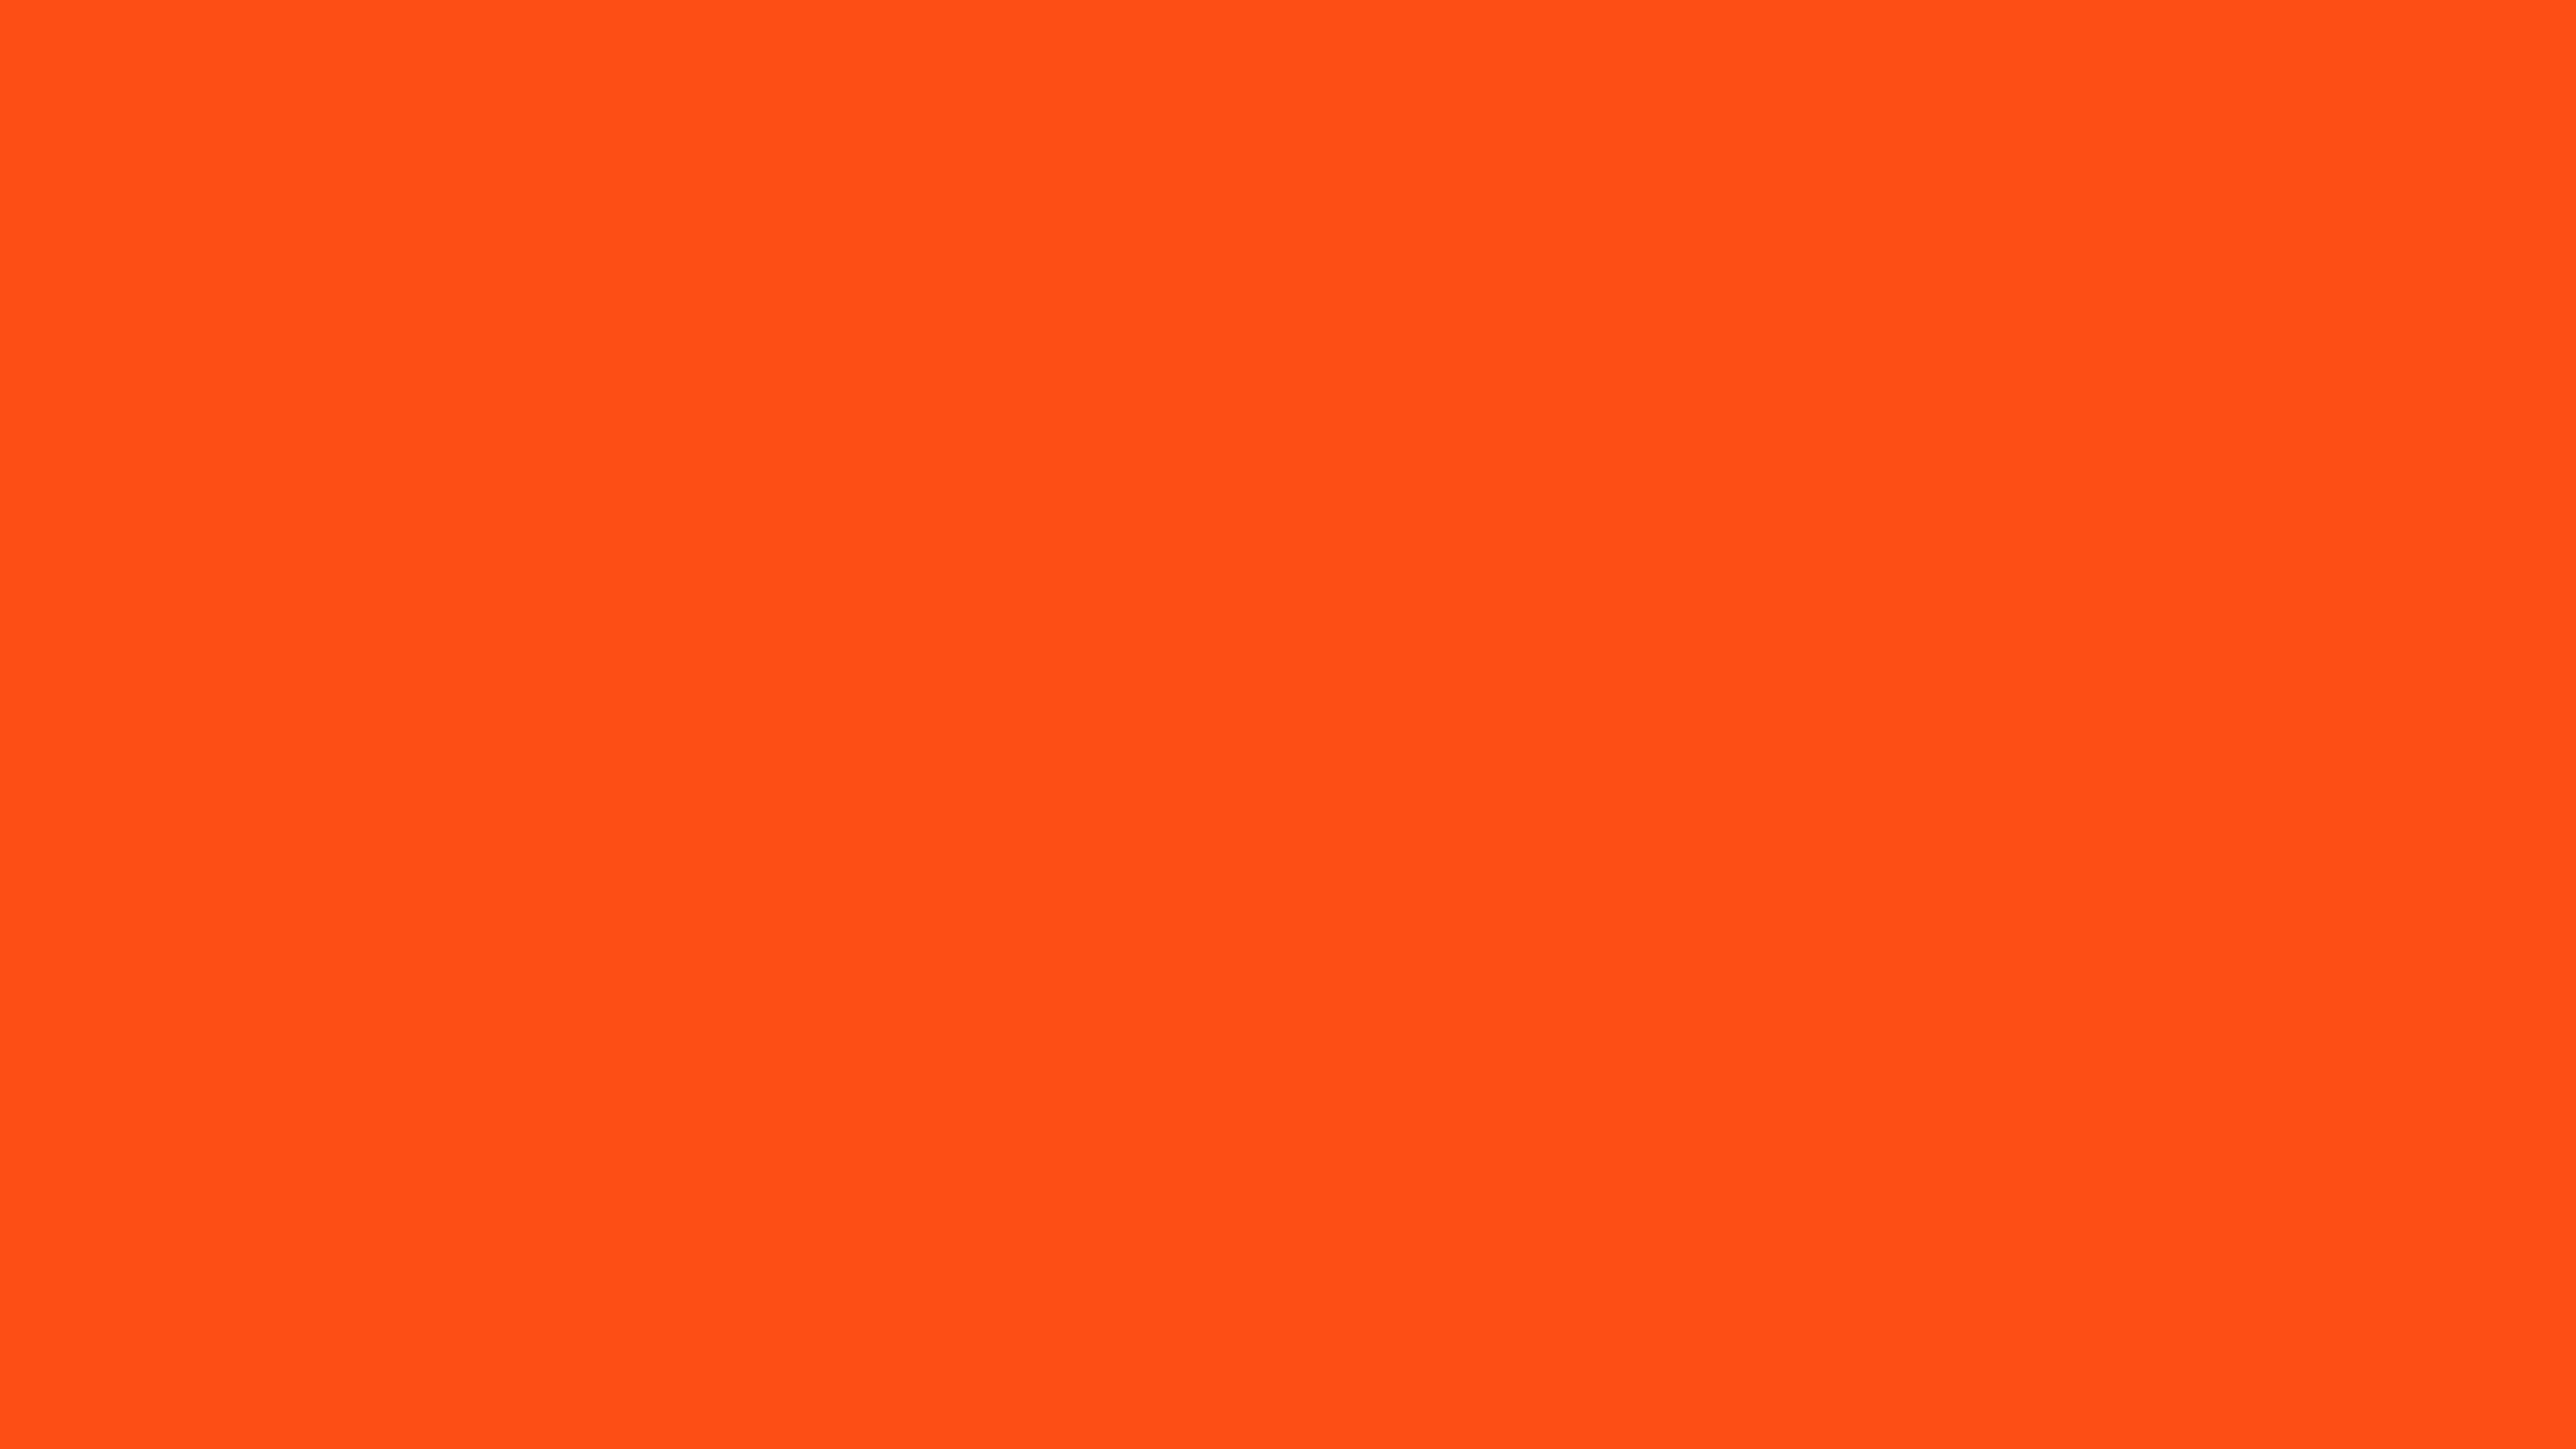 7680x4320 Orioles Orange Solid Color Background